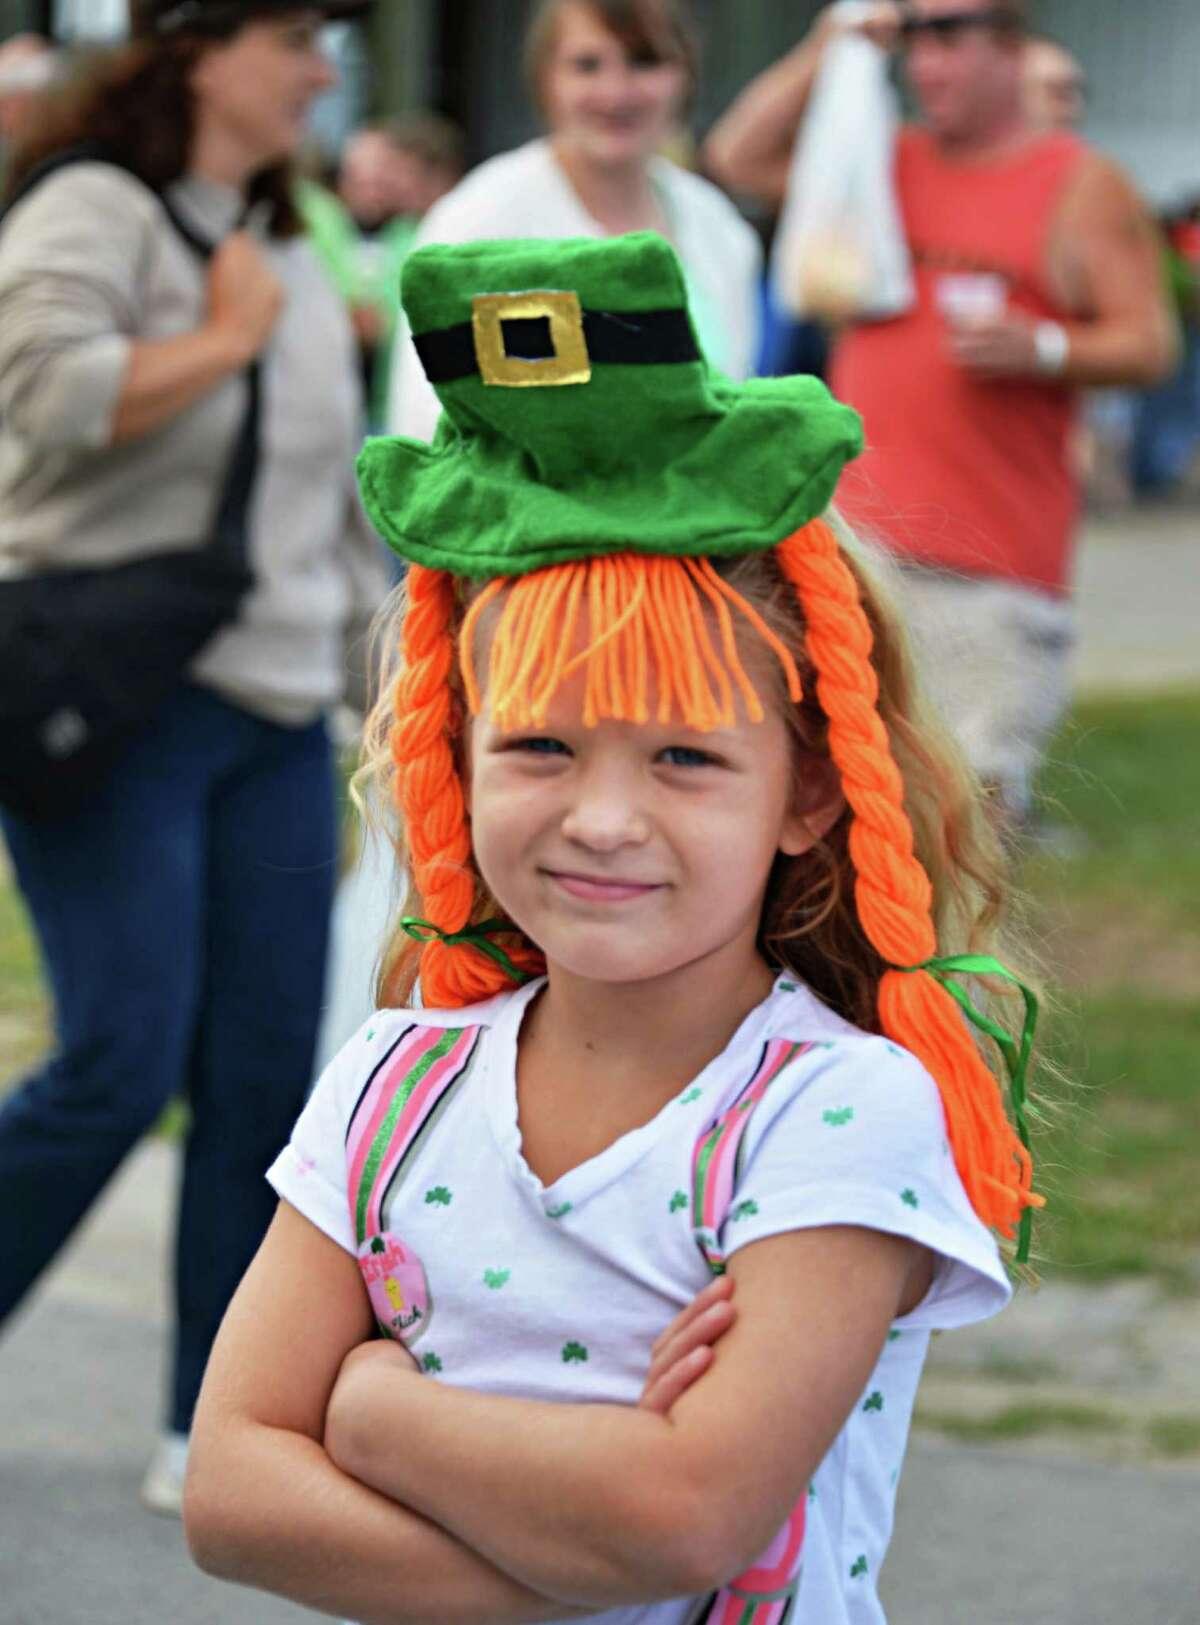 Katrina Momrow of Ballston Lake poses wearing her Irish hat at the16th Annual Irish 2000 Music & Arts Festival at Saratoga County Fairgrounds in Ballston Spa Saturday Sept. 15, 2012. (John Carl D'Annibale / Times Union)